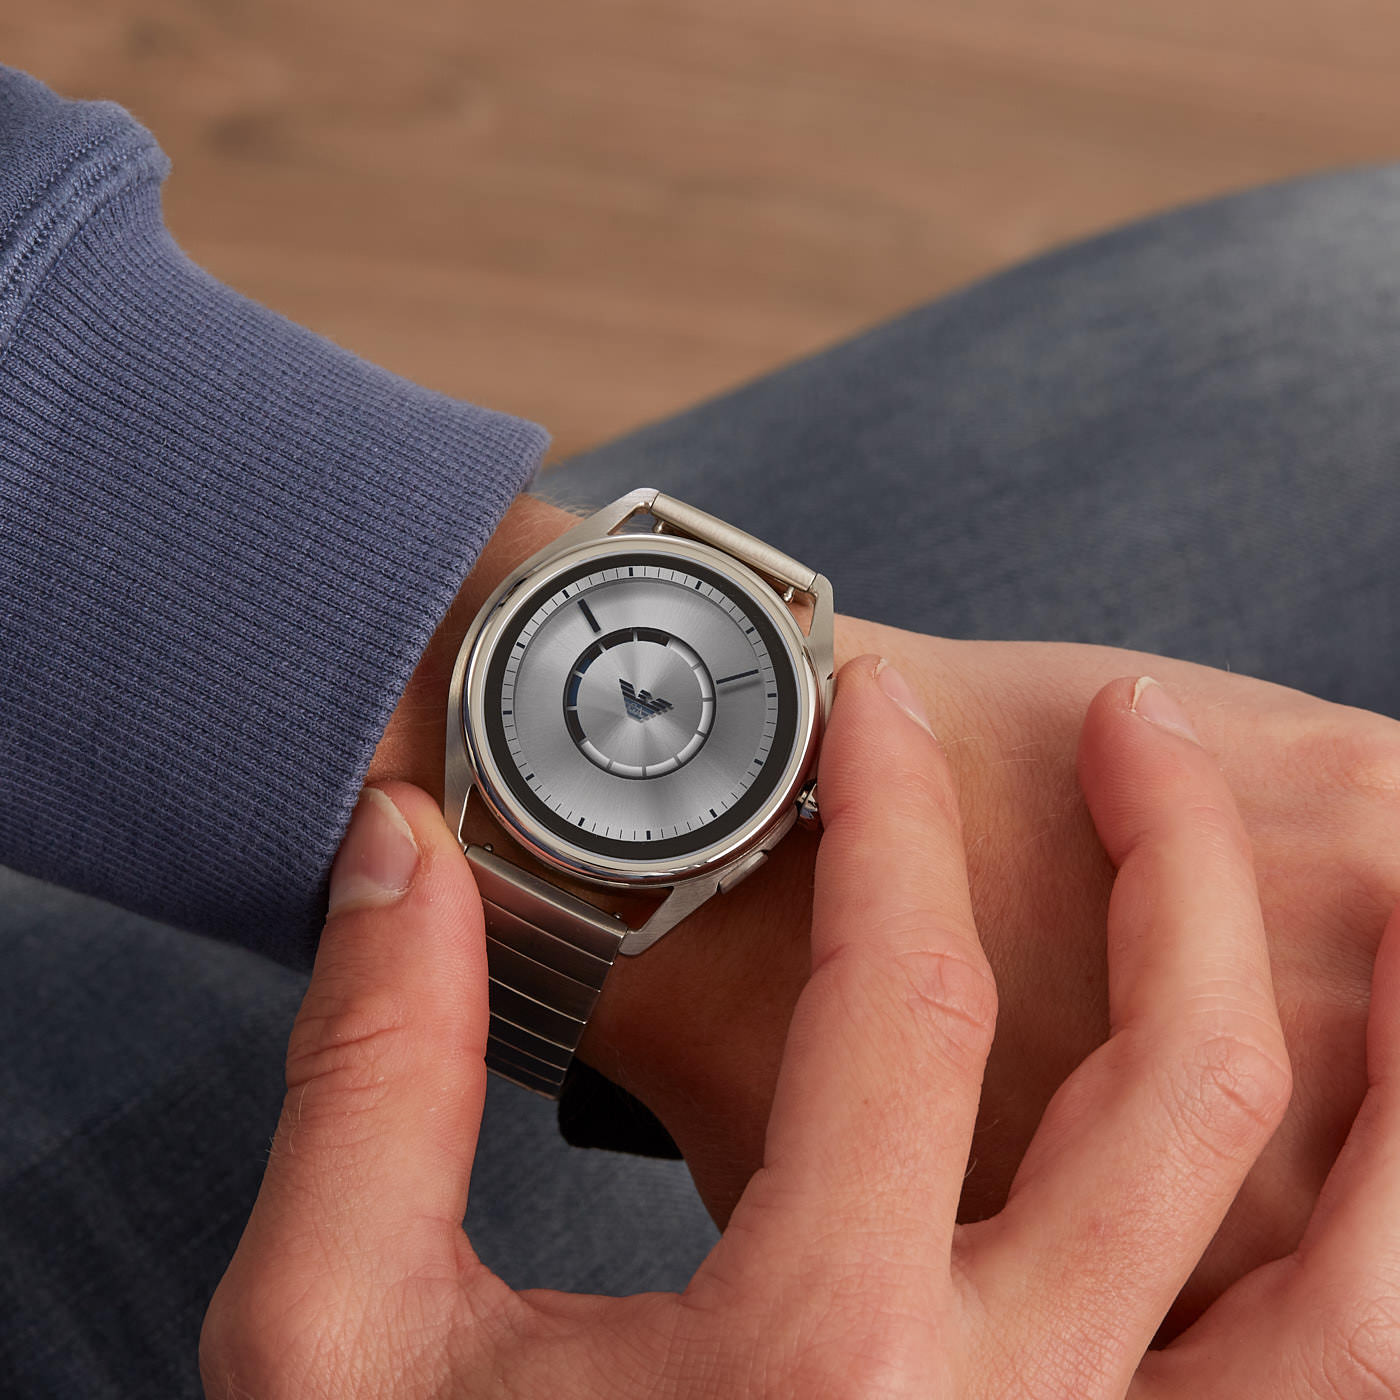 Emporio Armani Connected Matteo Gen 4 Display Smartwatch ART5006